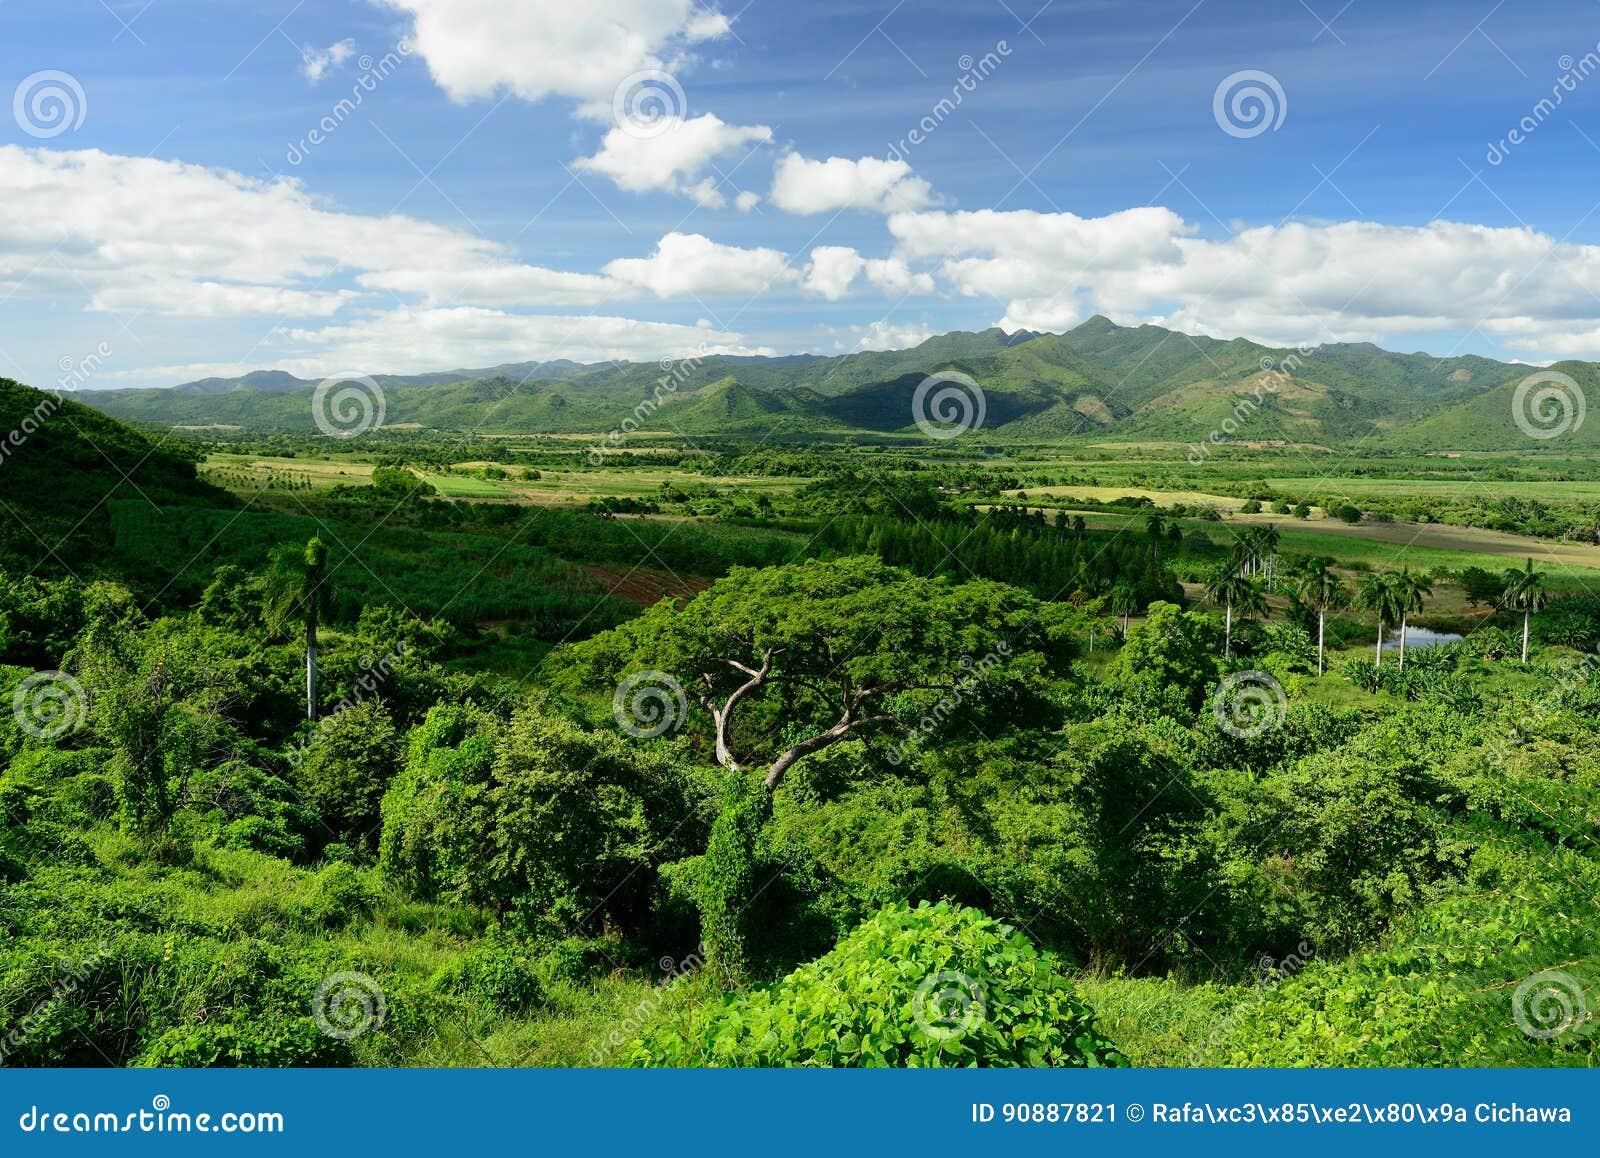 Tal Valle de Los Ingenios nahe Trinidad-Stadt in Kuba